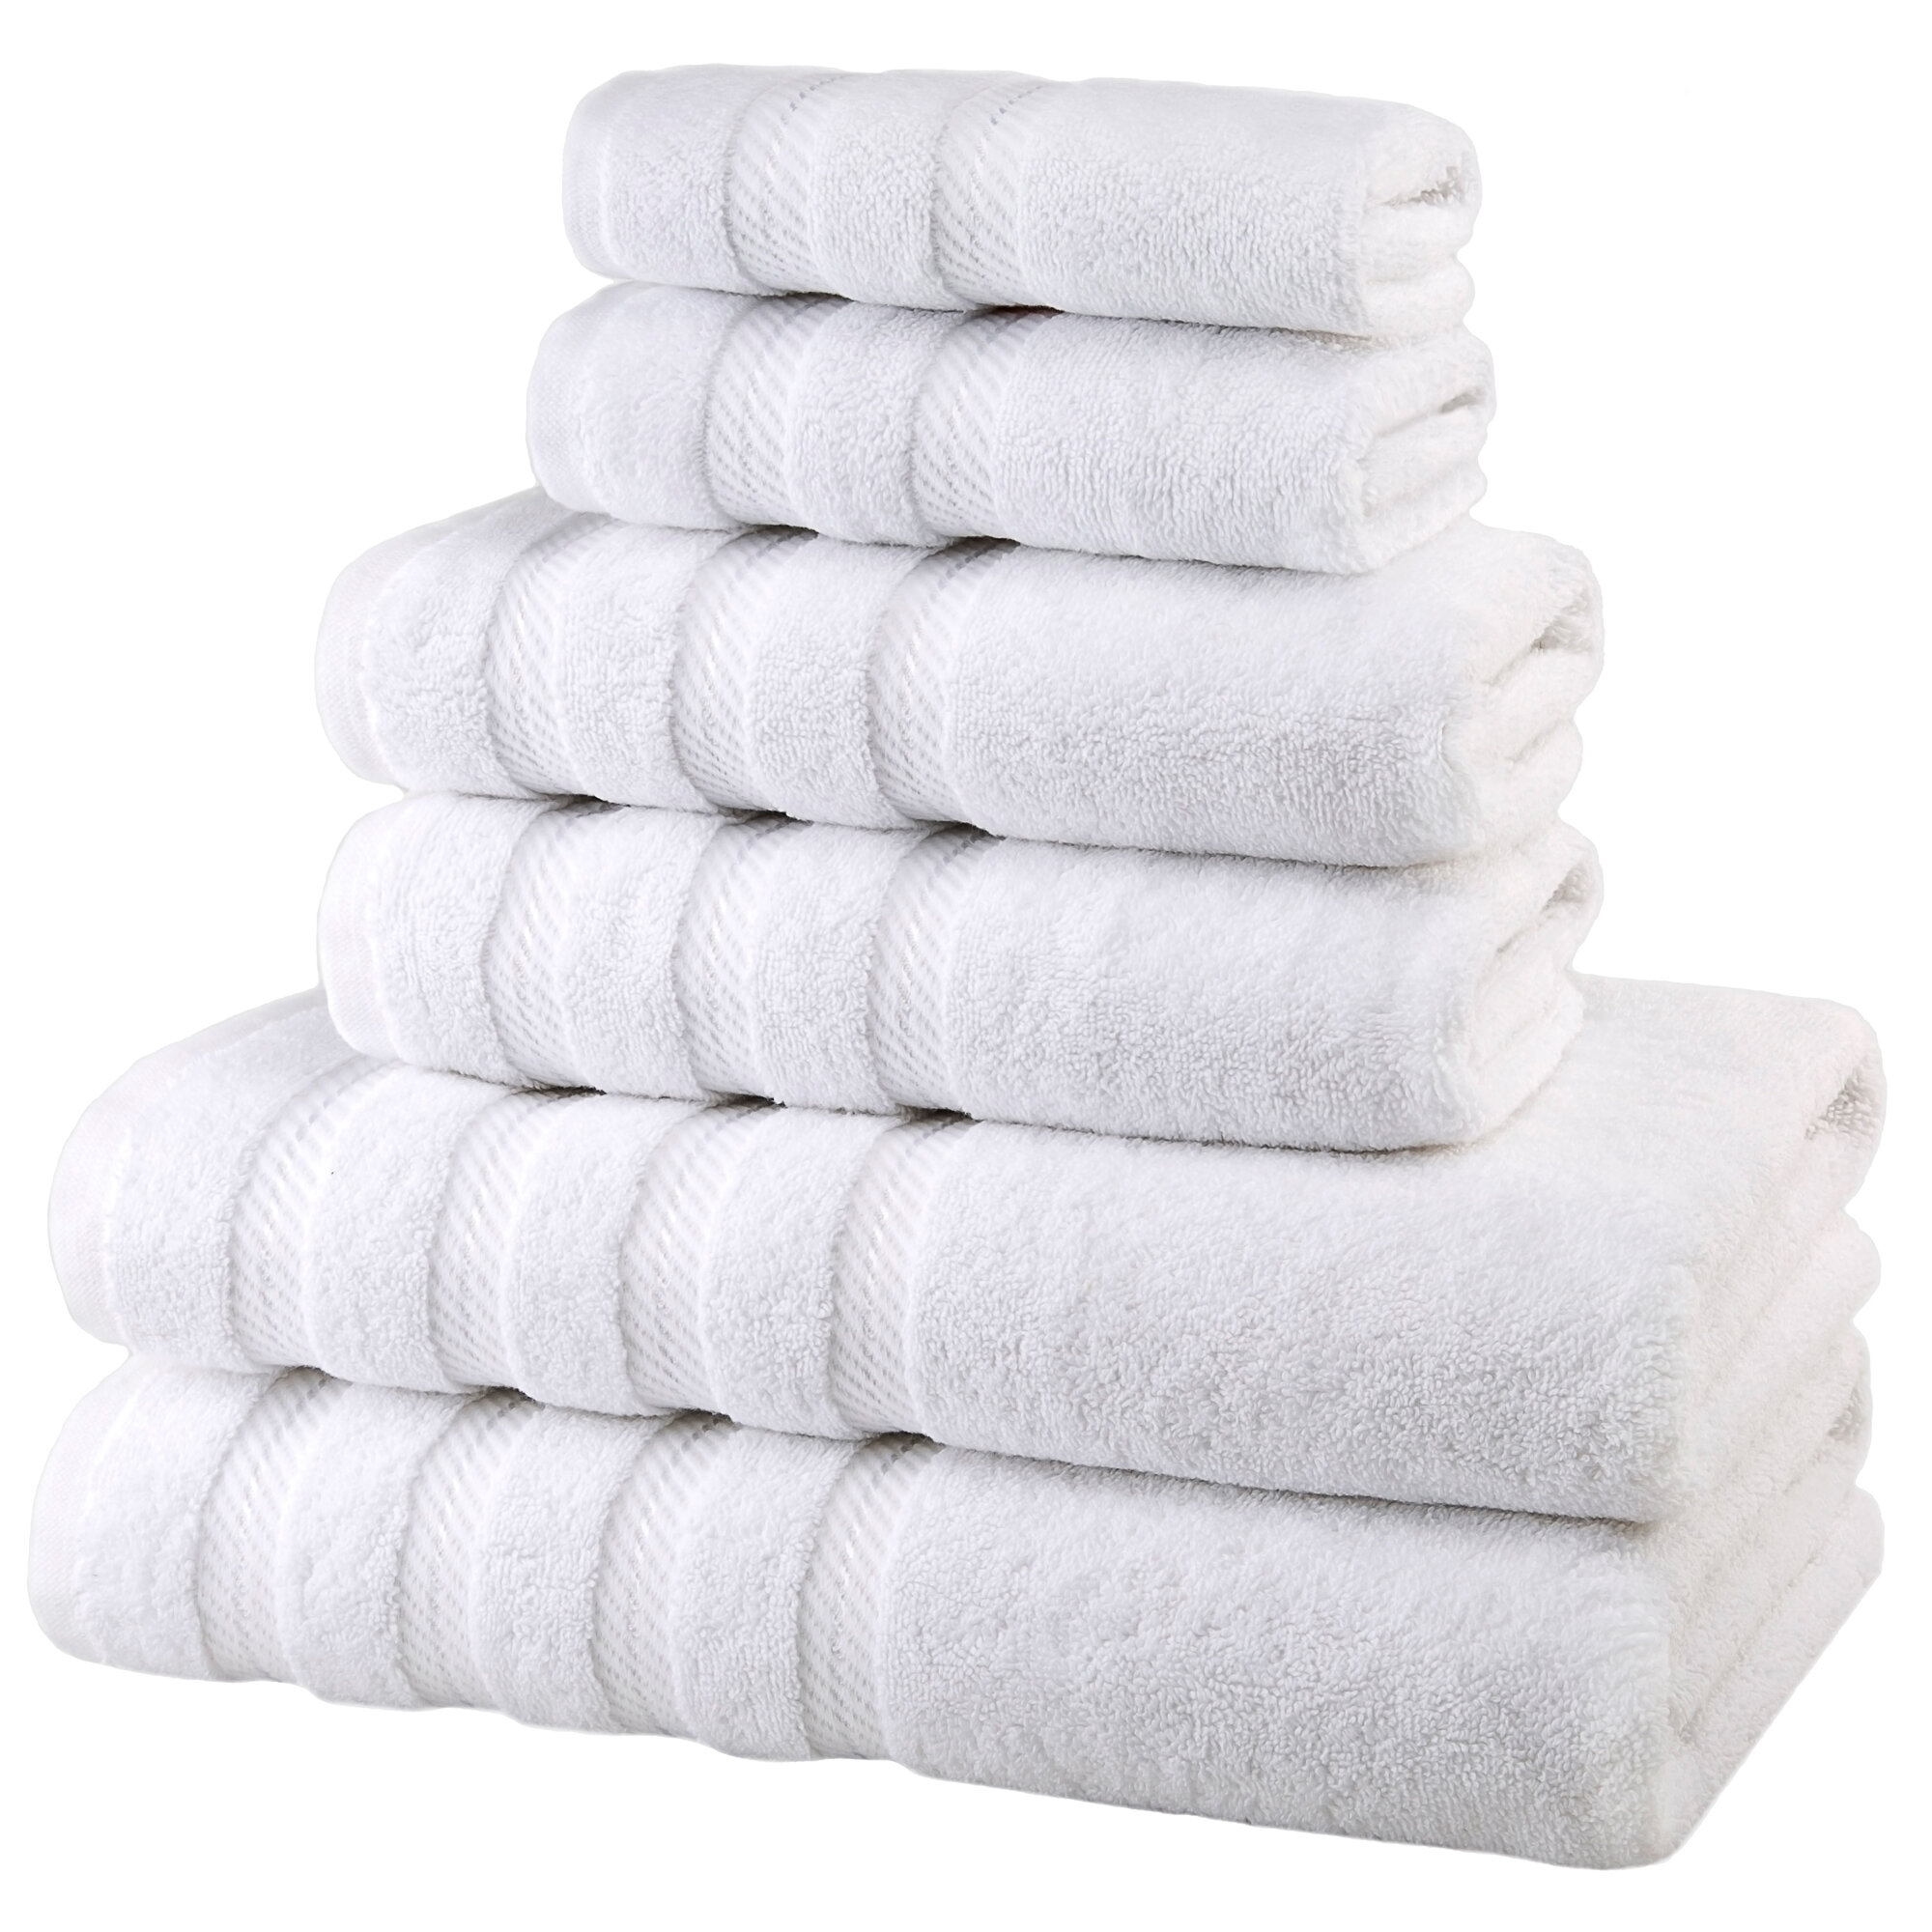 Pool Gym Towels Set Lightweight Bath Towel Set Cobra Kai Printing Washcloths Bathroom Super Soft Extra Large Bath Towel Beach Bathtub Quick Drying WBinHua Biancheria da Bagno Travel